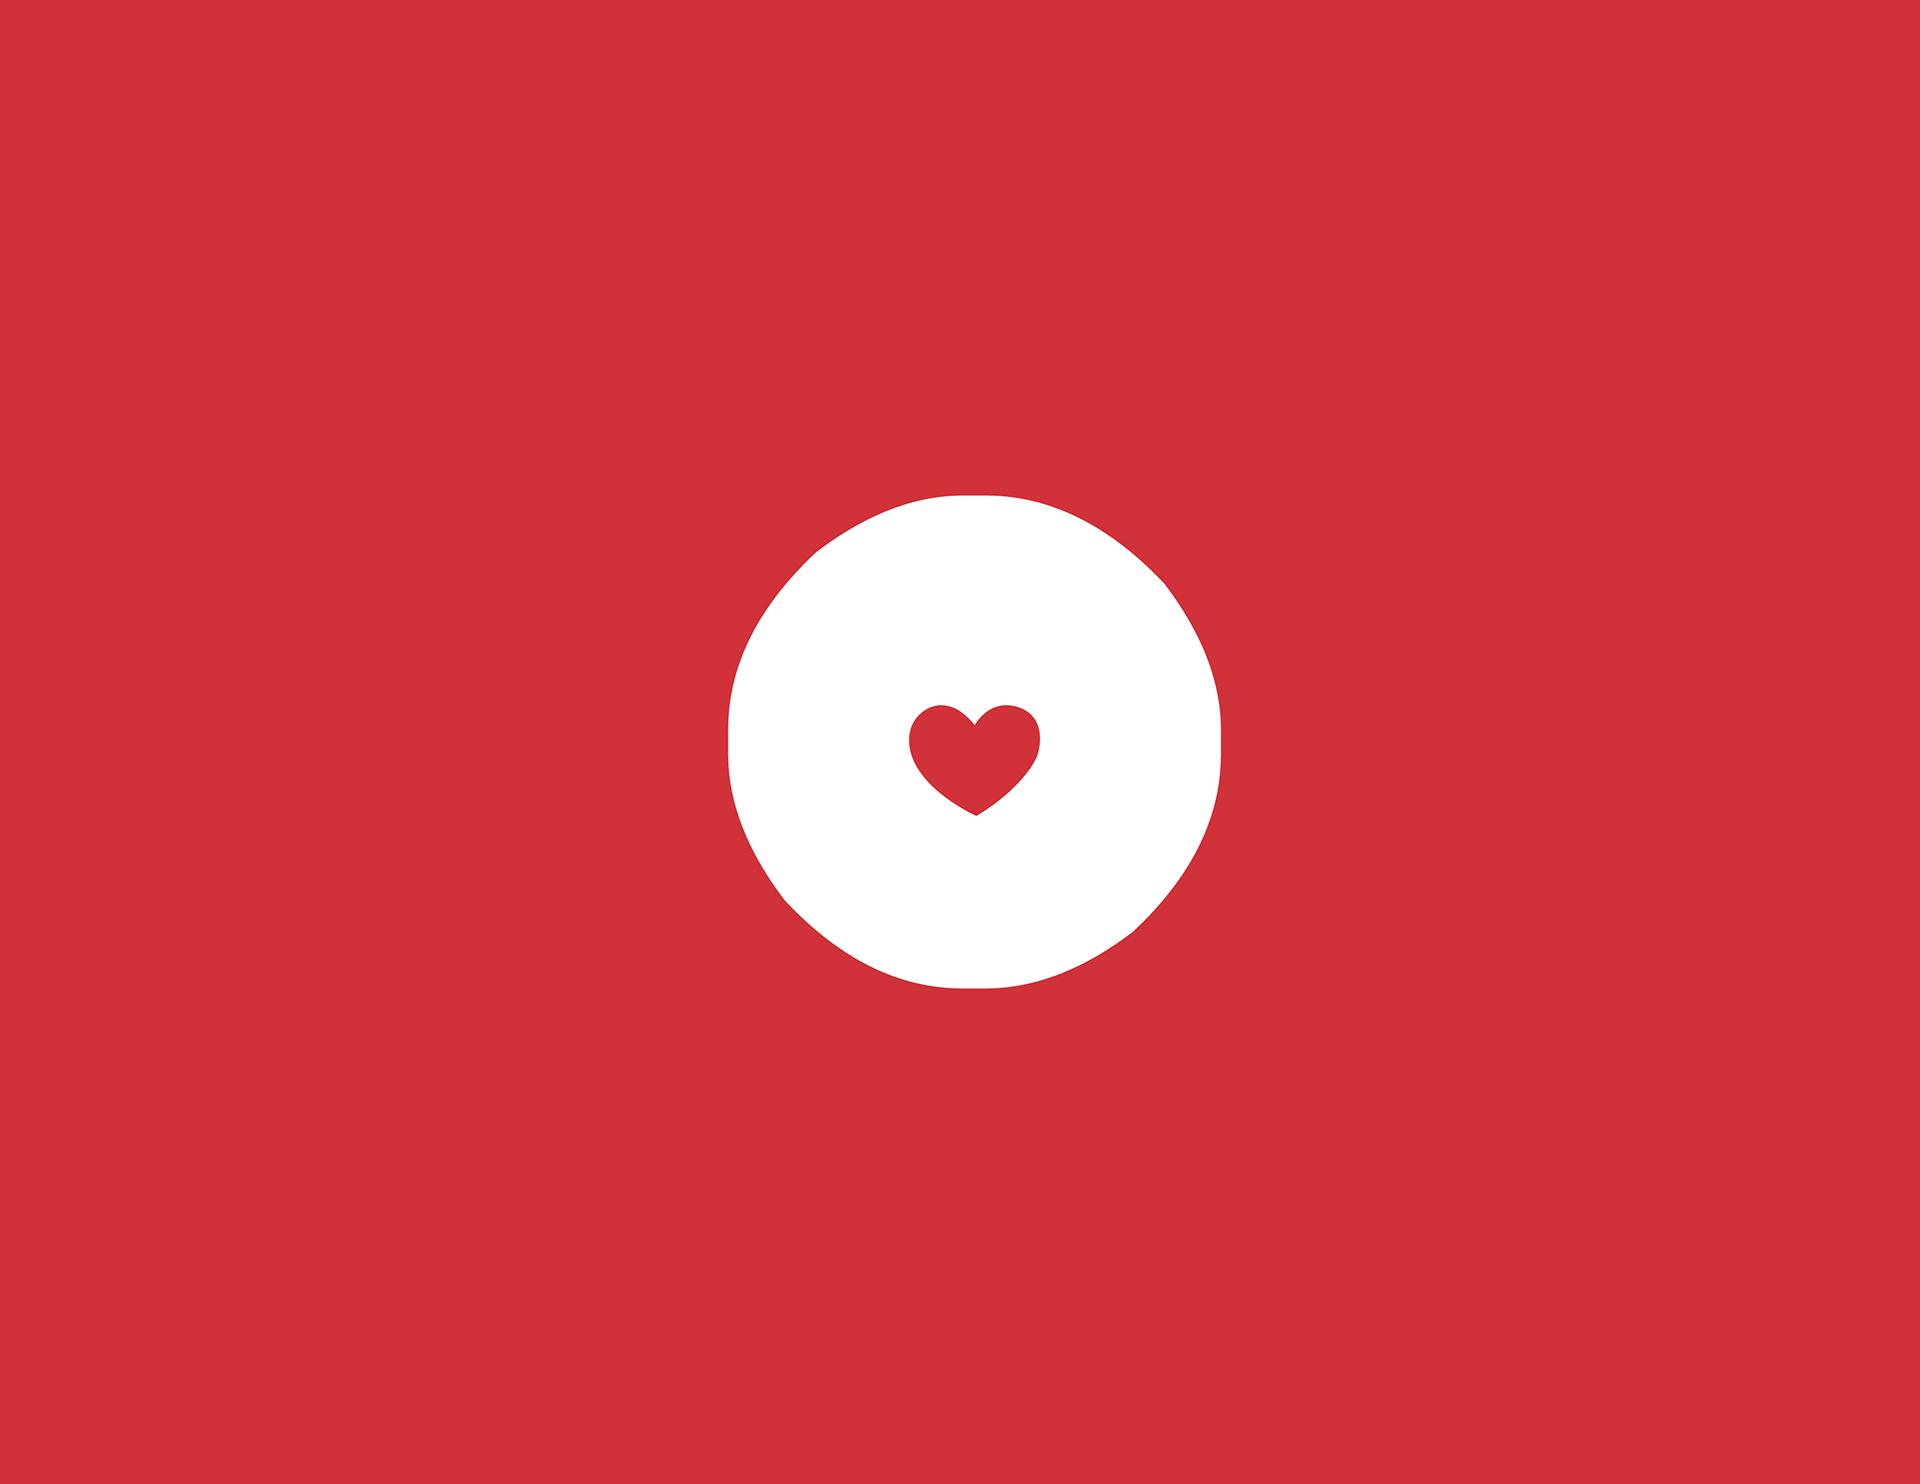 трансплантация сердца картинка